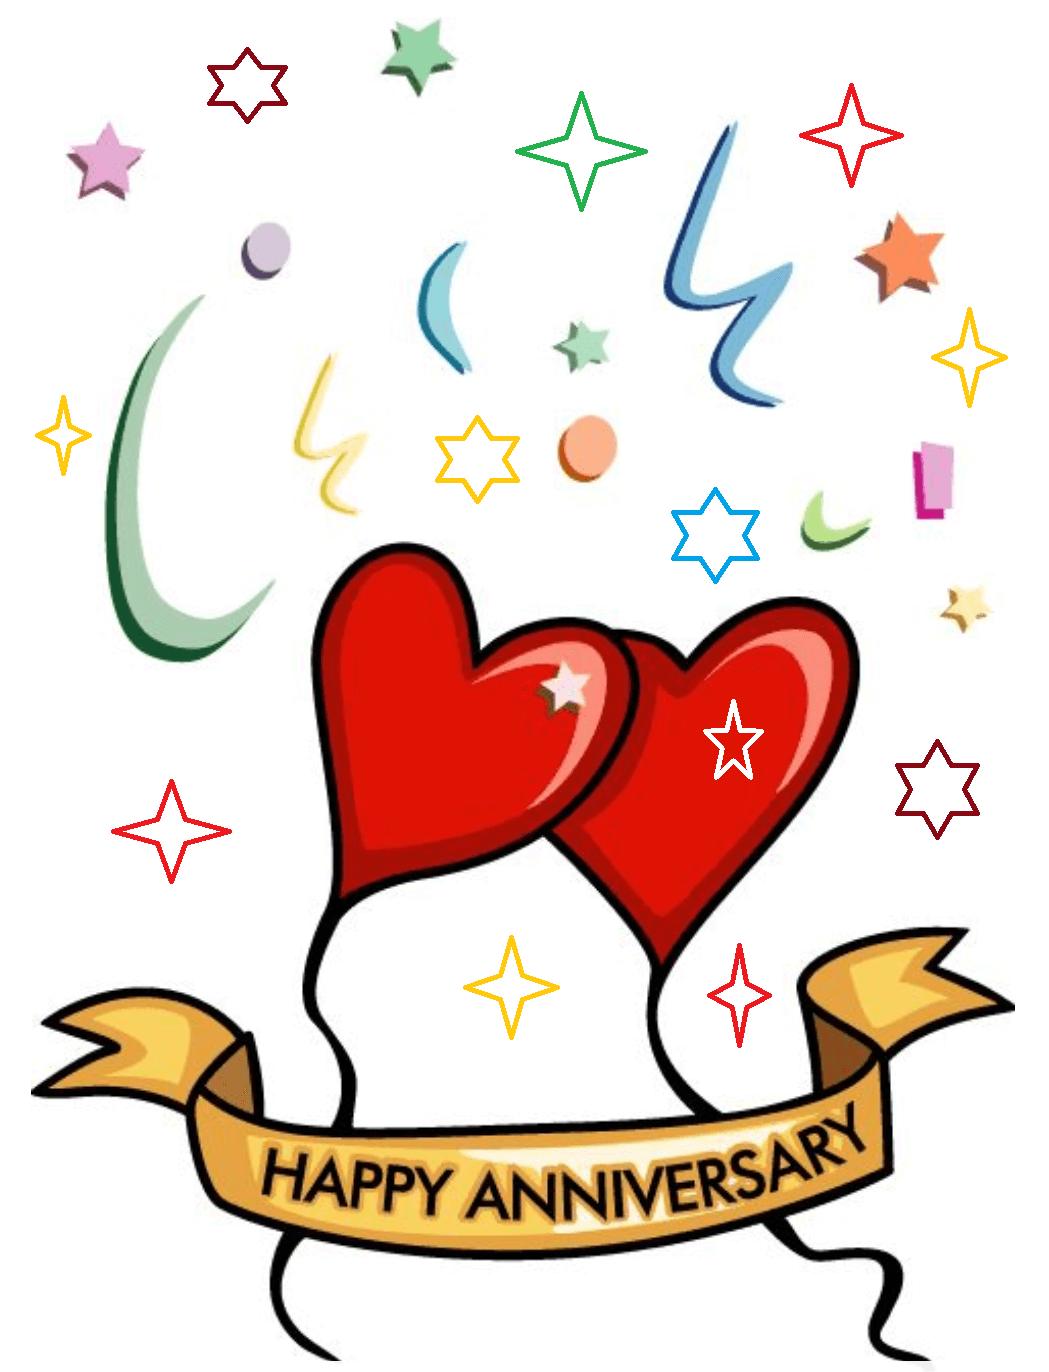 Snoopy happy anniversary clipart clip art free stock Anniversary Clipart Images Free | Wedding Anniversary ... clip art free stock